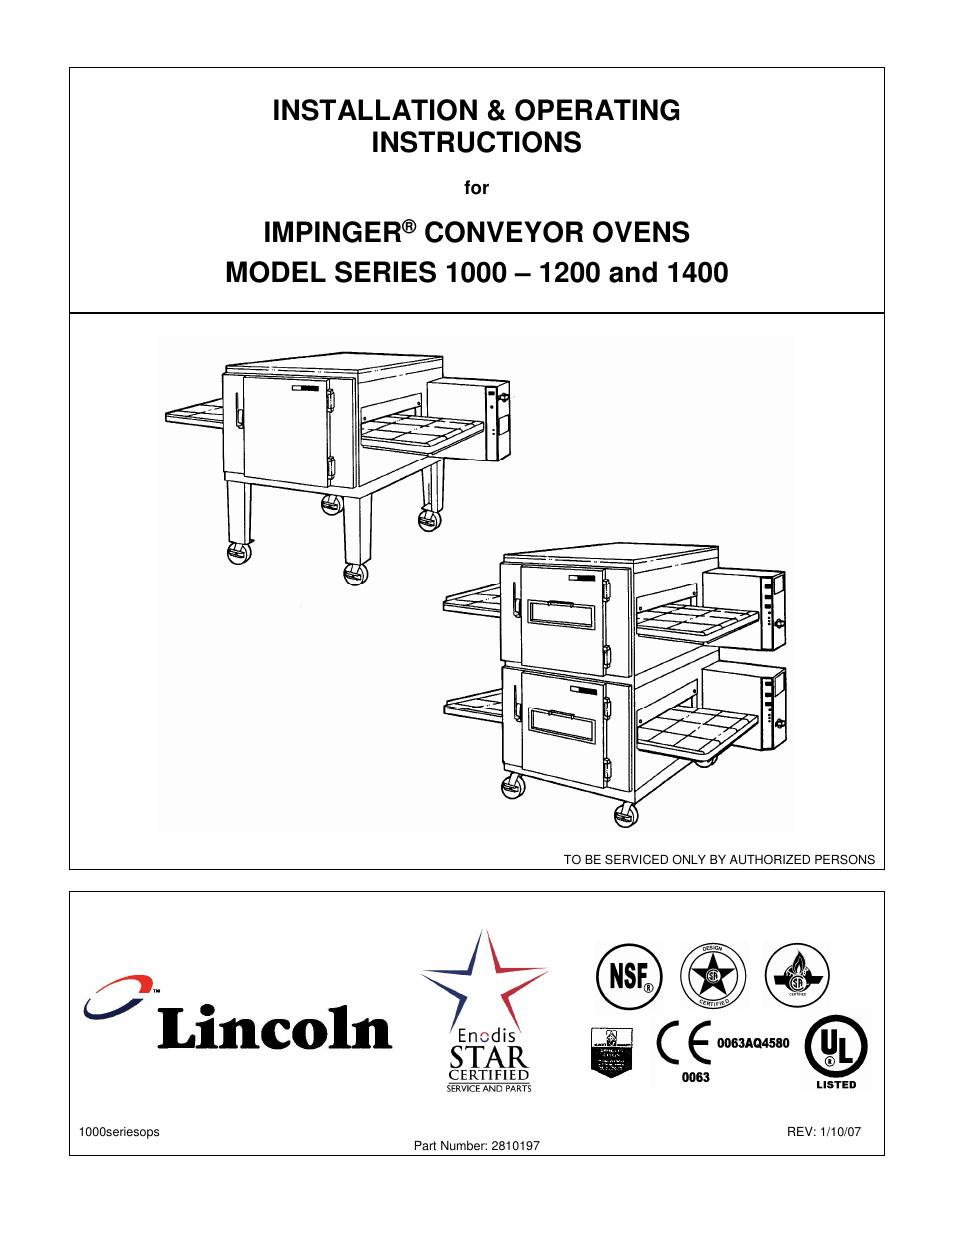 Lincoln Impinger 1132 Wiring Diagram Page 2 And Conveyor Belt 1200 User Manual 20 Pages Rh Manuair Com 1999 Navigator Engine